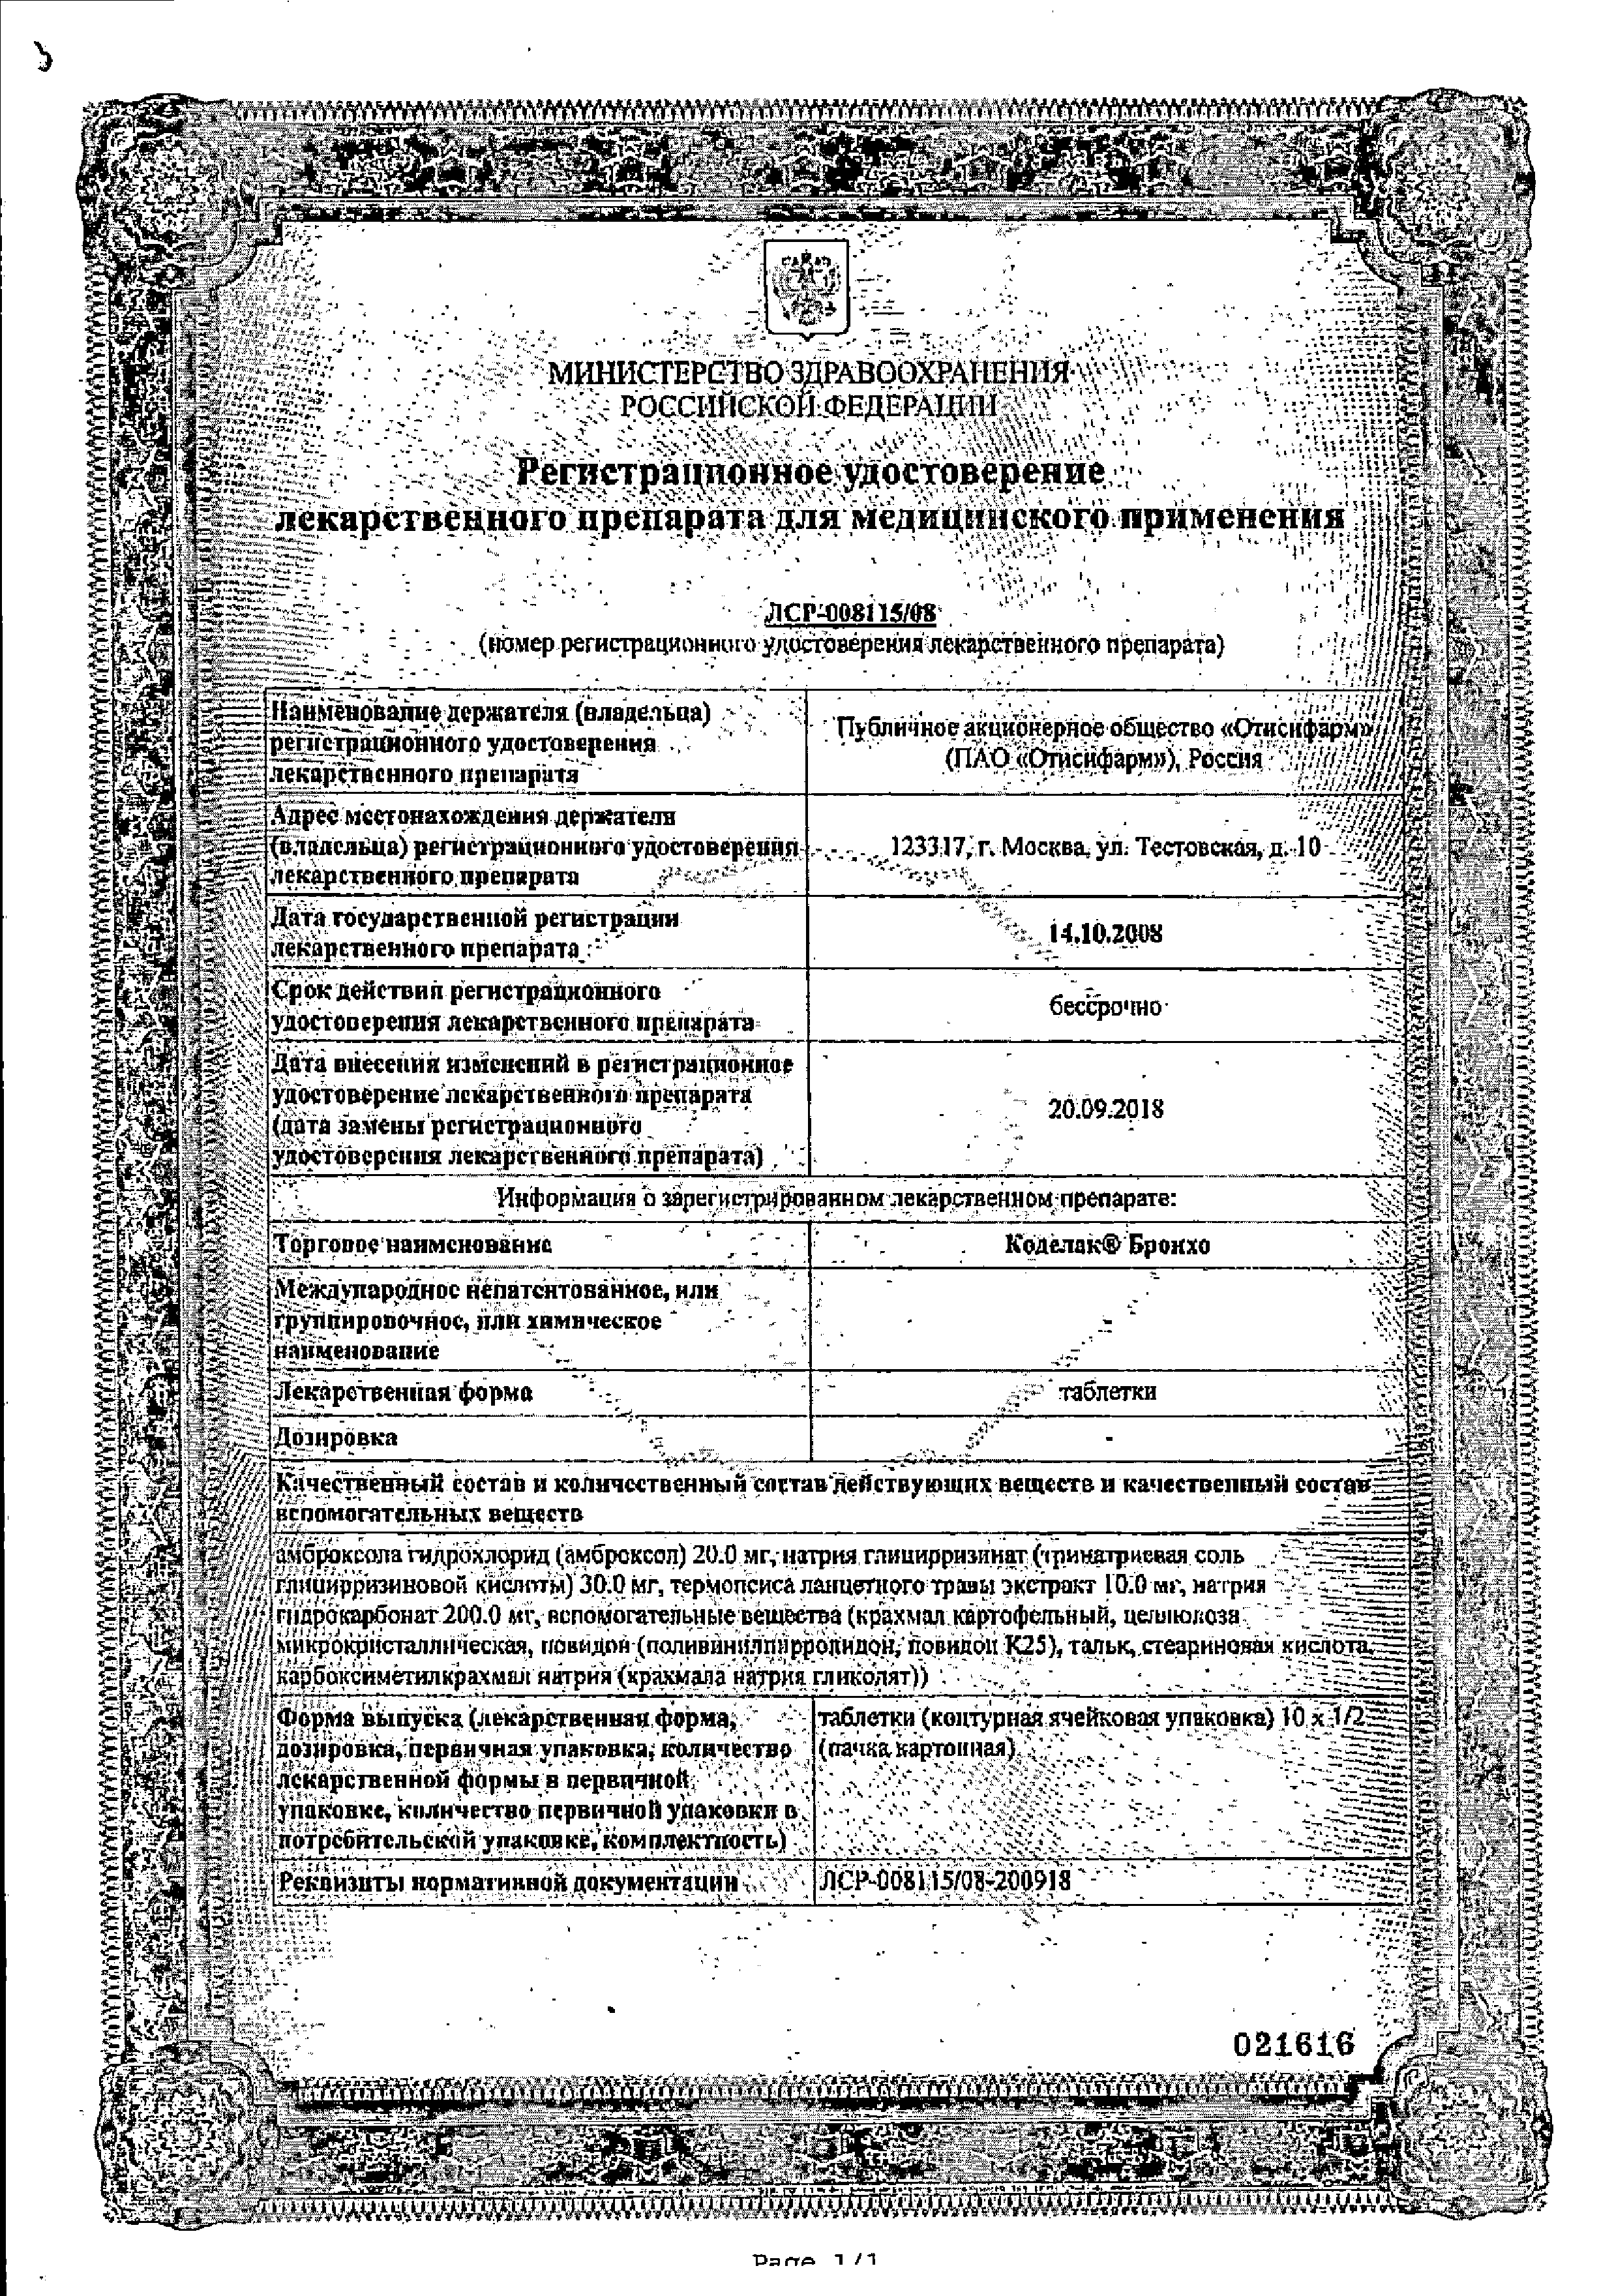 Коделак Бронхо сертификат